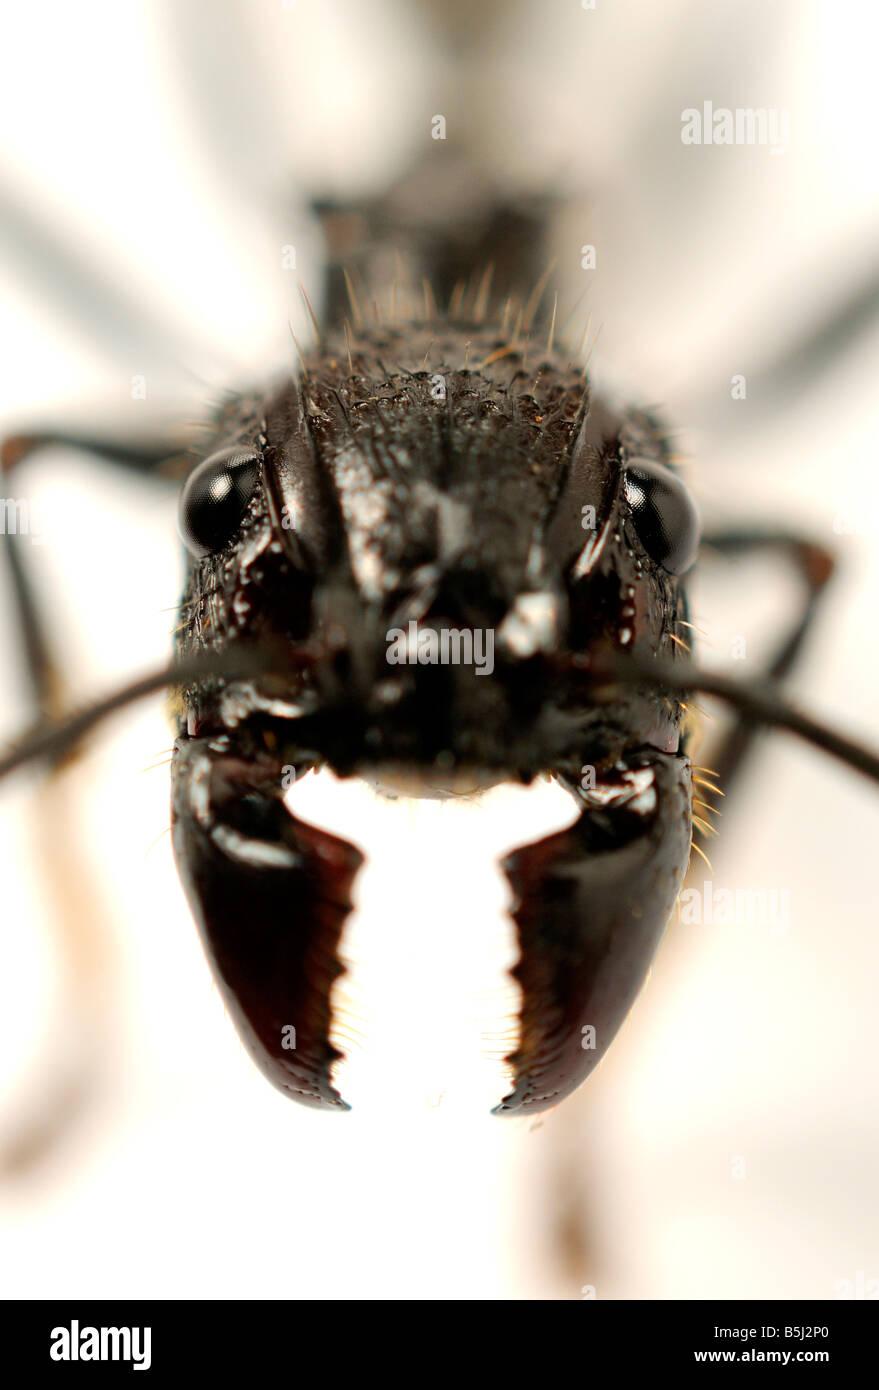 Isula or Bullet Ant Paraponera clavata ant Stock Photo